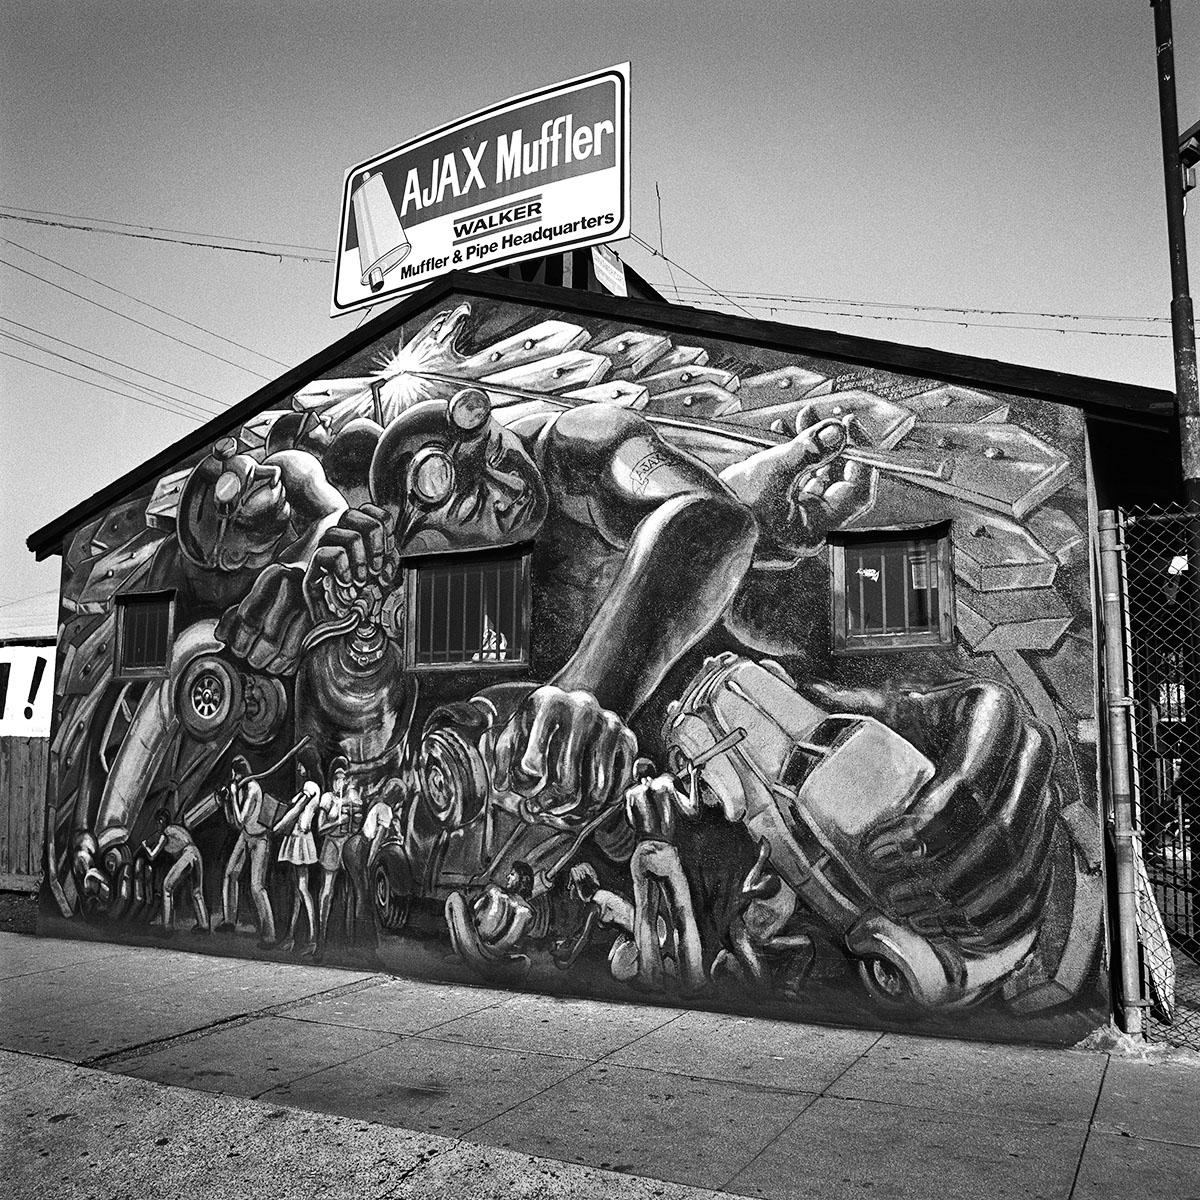 Muffler Shop, East Los Angeles, 1978